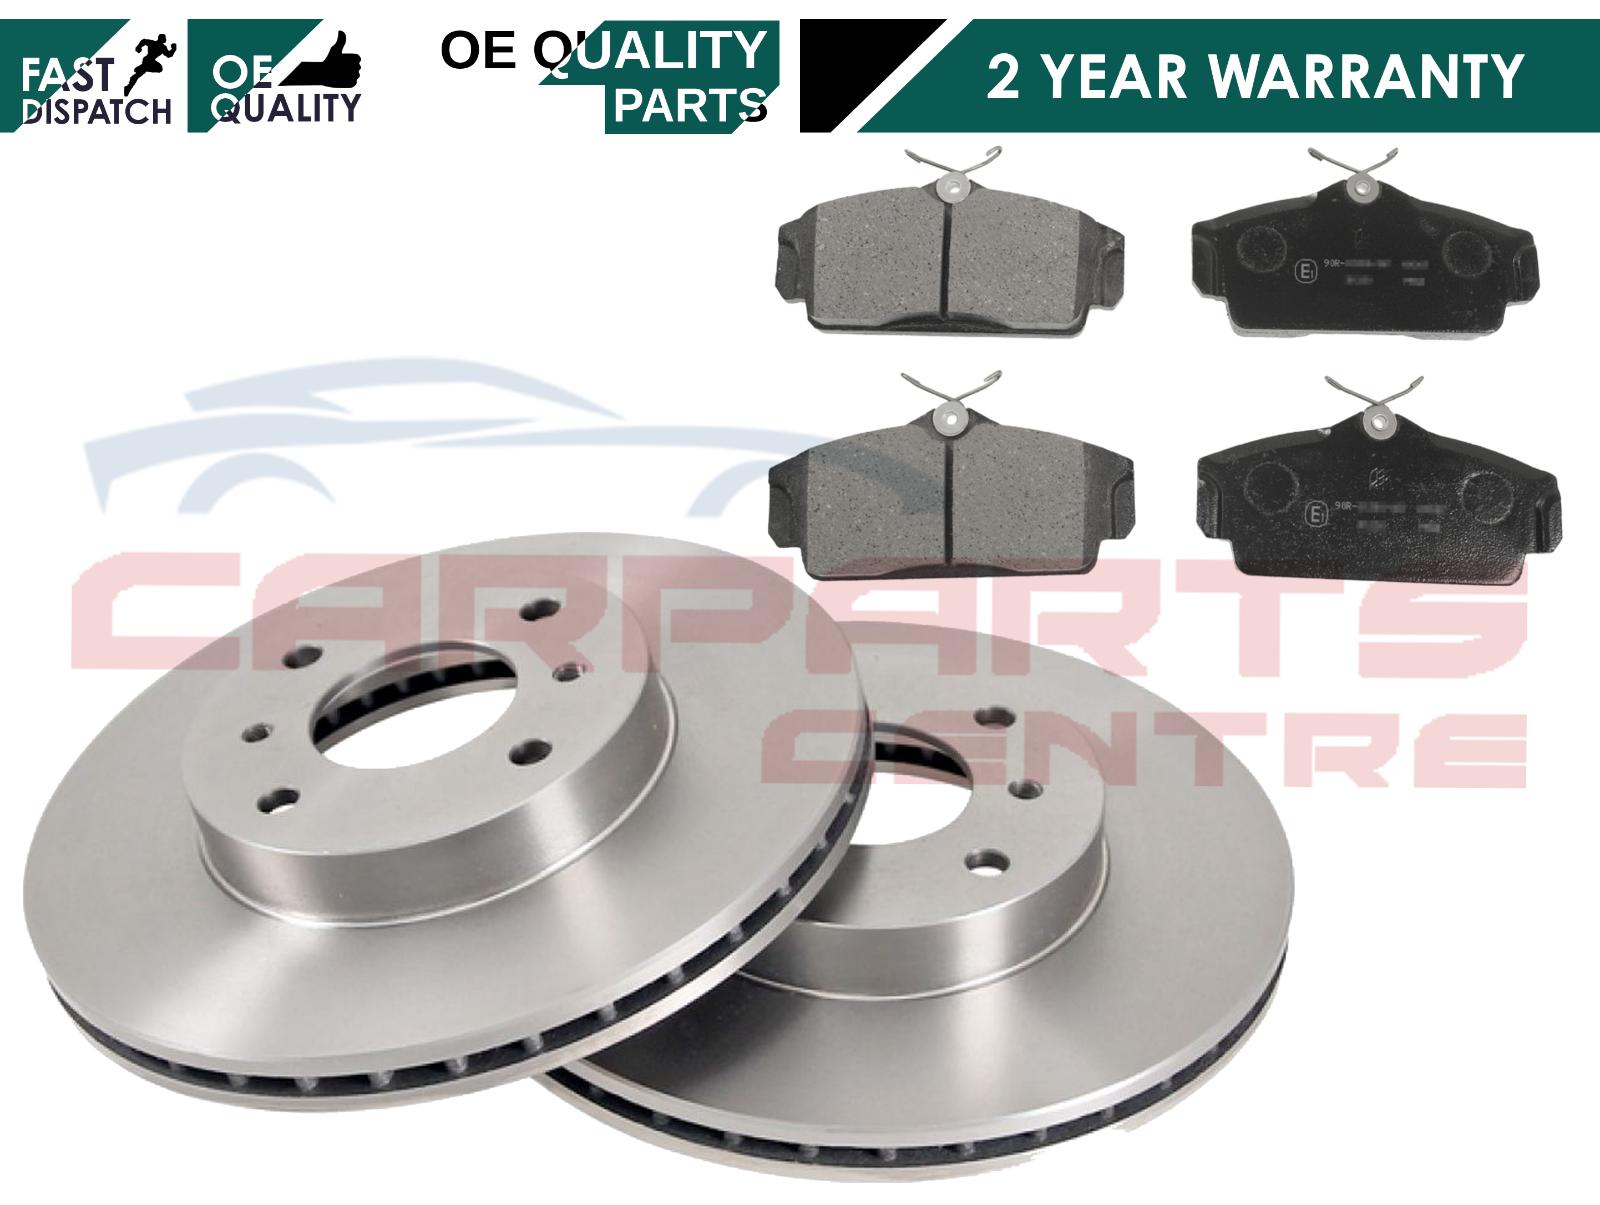 Jaguar X-Type Petrol Diesel Front Brake Pads Set 2002-2010 *OE QUALITY*